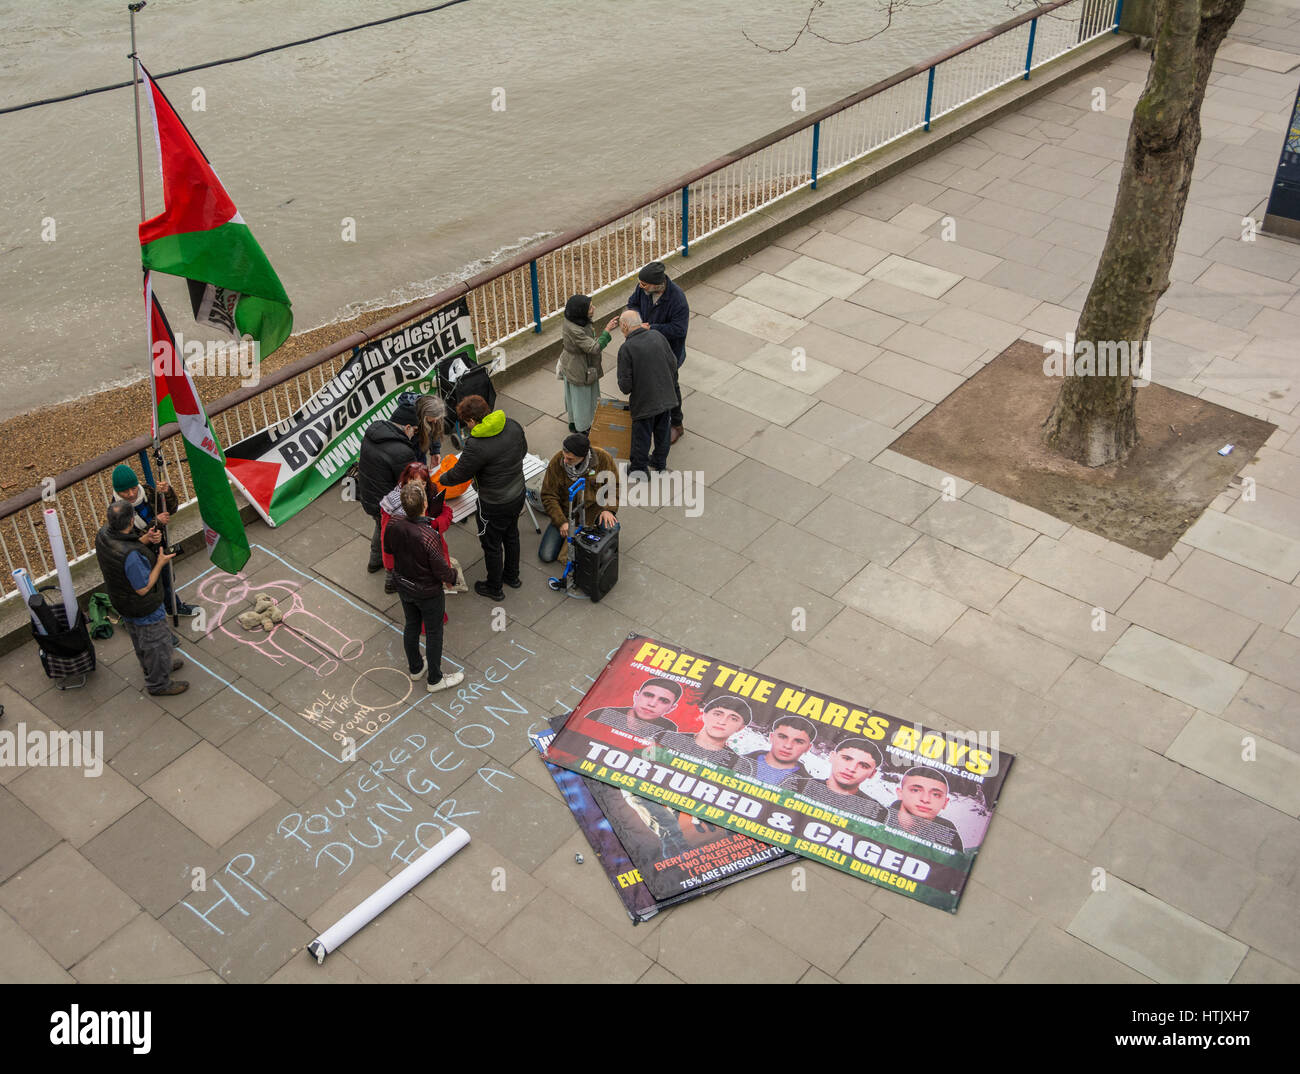 Free the Palestinian Hares Boys Stock Photo